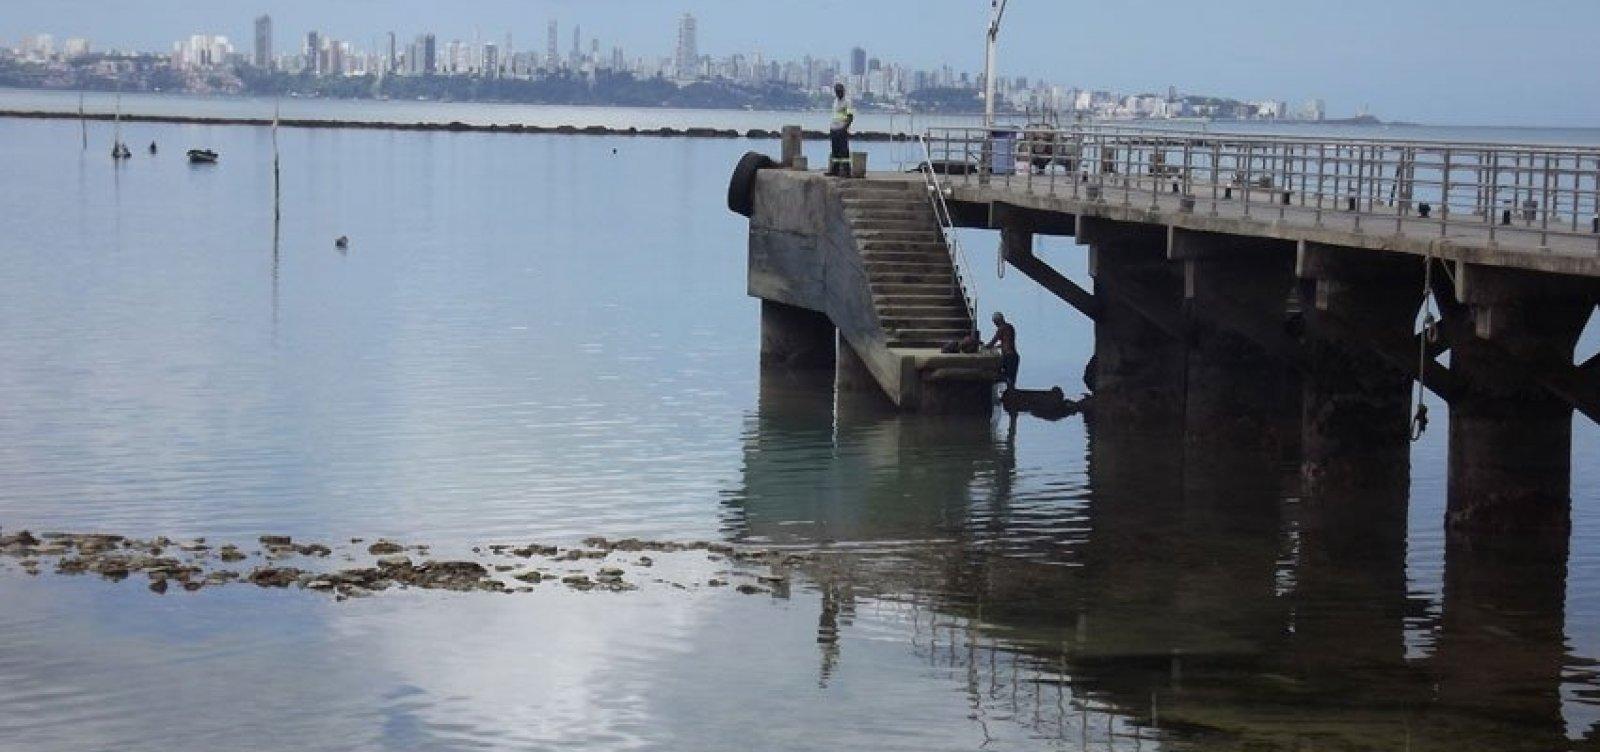 [ONG denuncia suposto crime ambiental em Mar Grande]